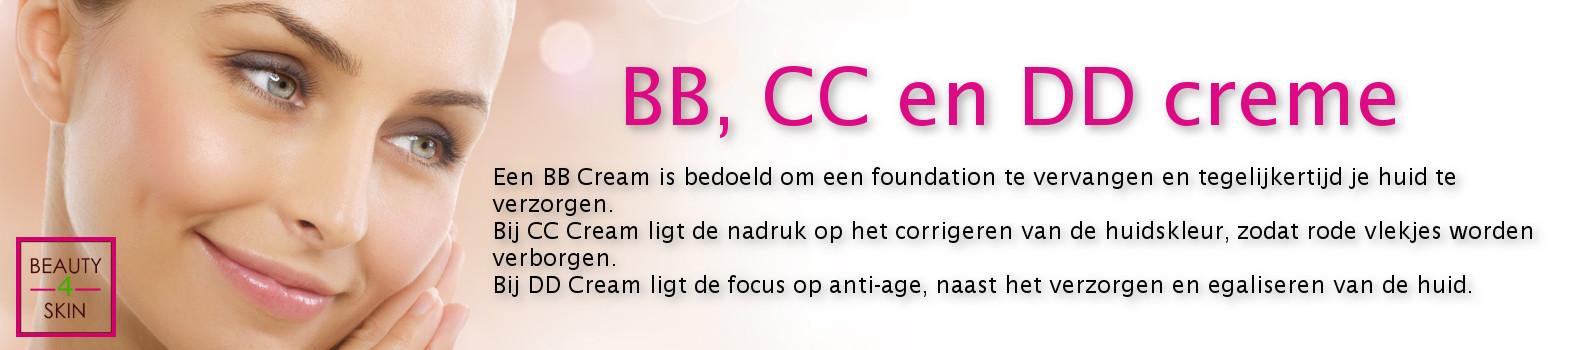 BB CC & DD Crème